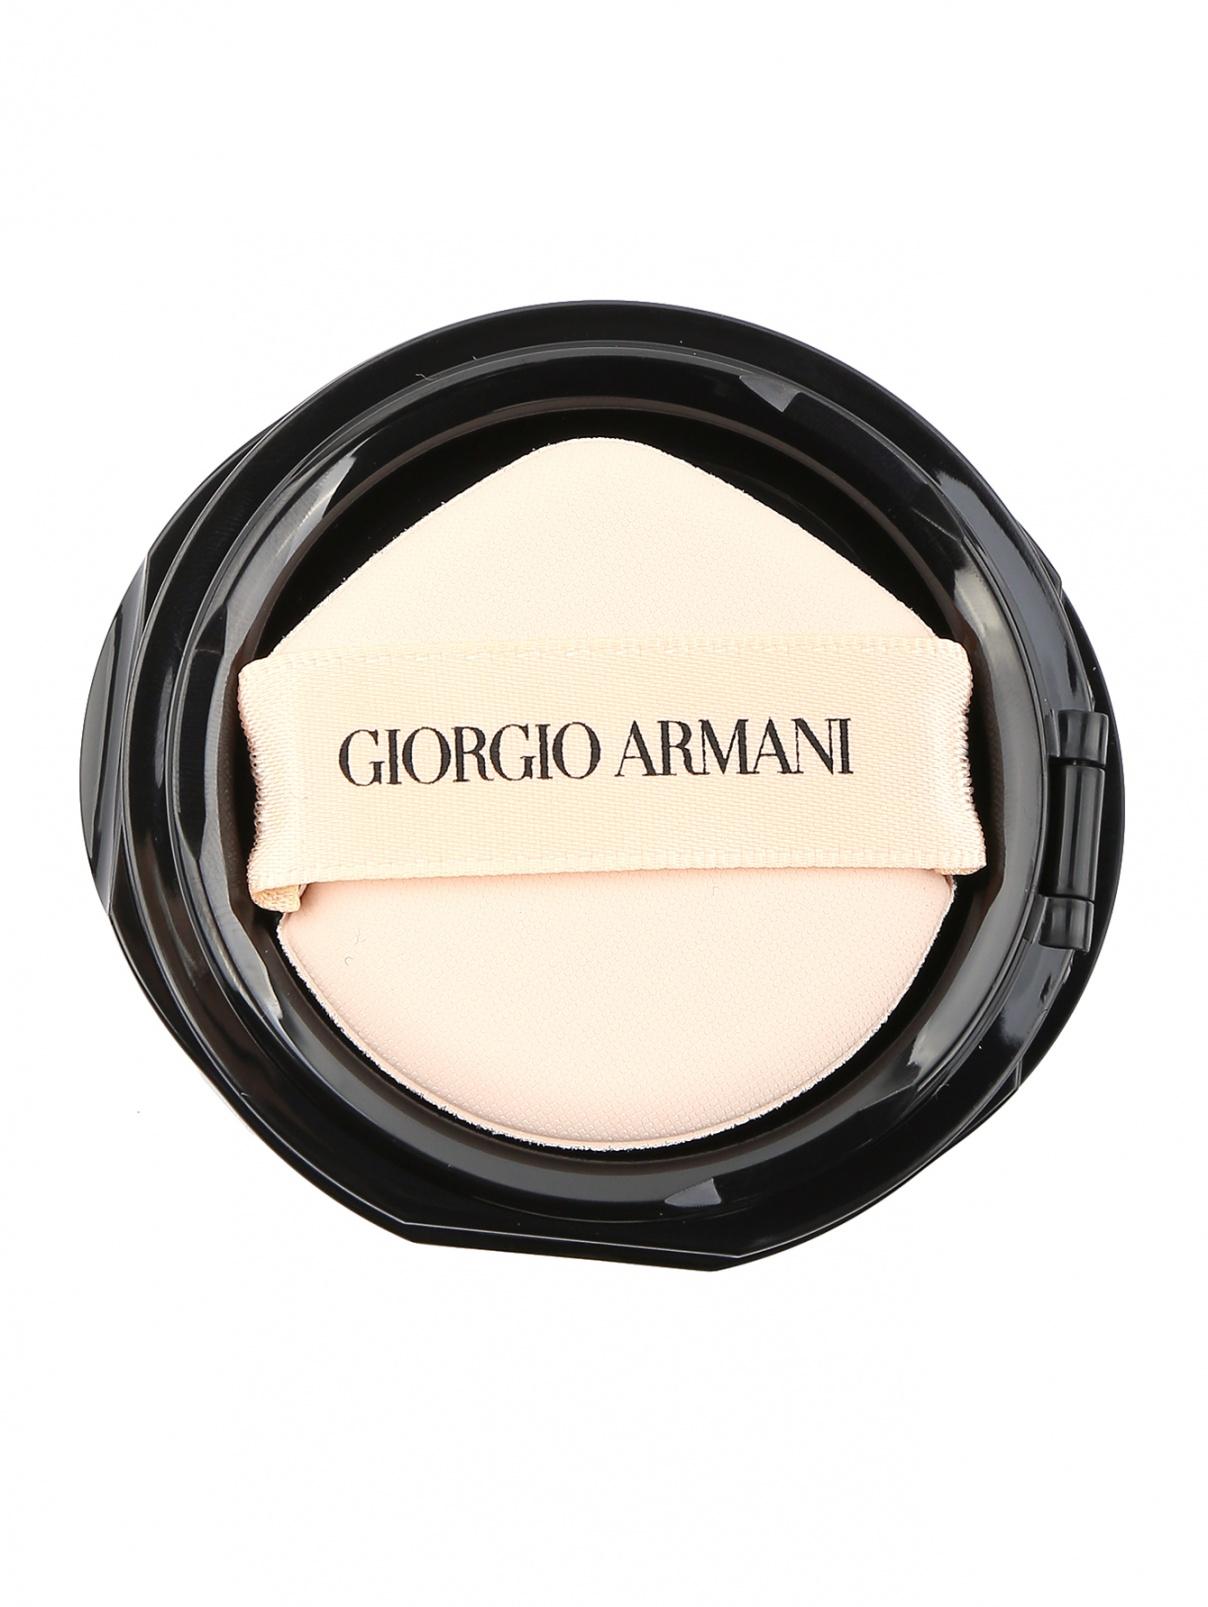 Кушон сменный блок 4 15гр Armani to go Giorgio Armani  –  Общий вид